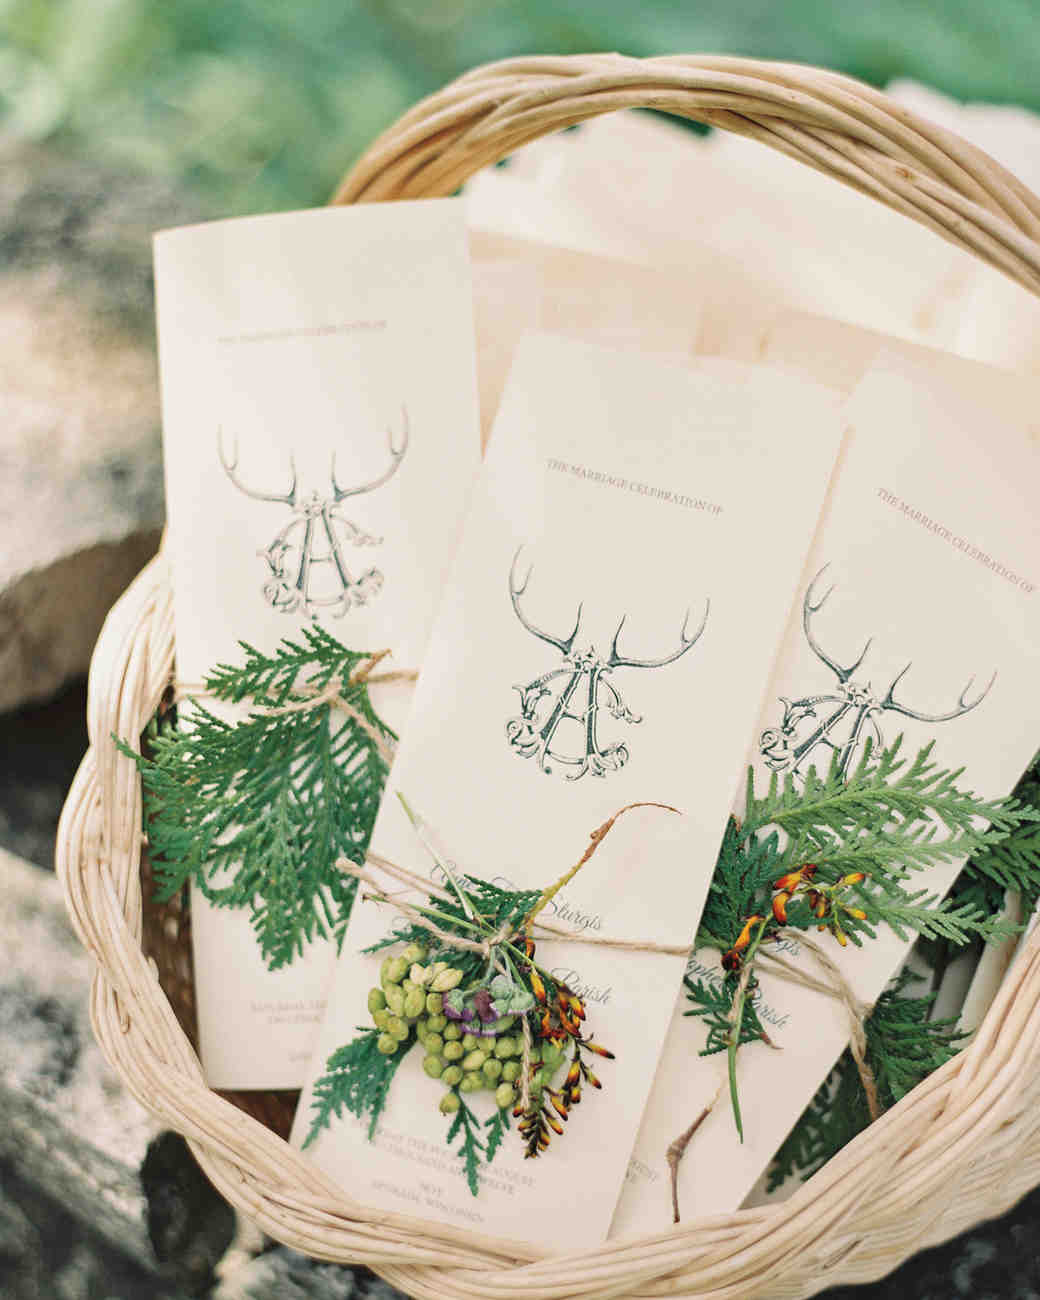 basket-invitations-evergreen-door-county-wi-041-mwds110744.jpg